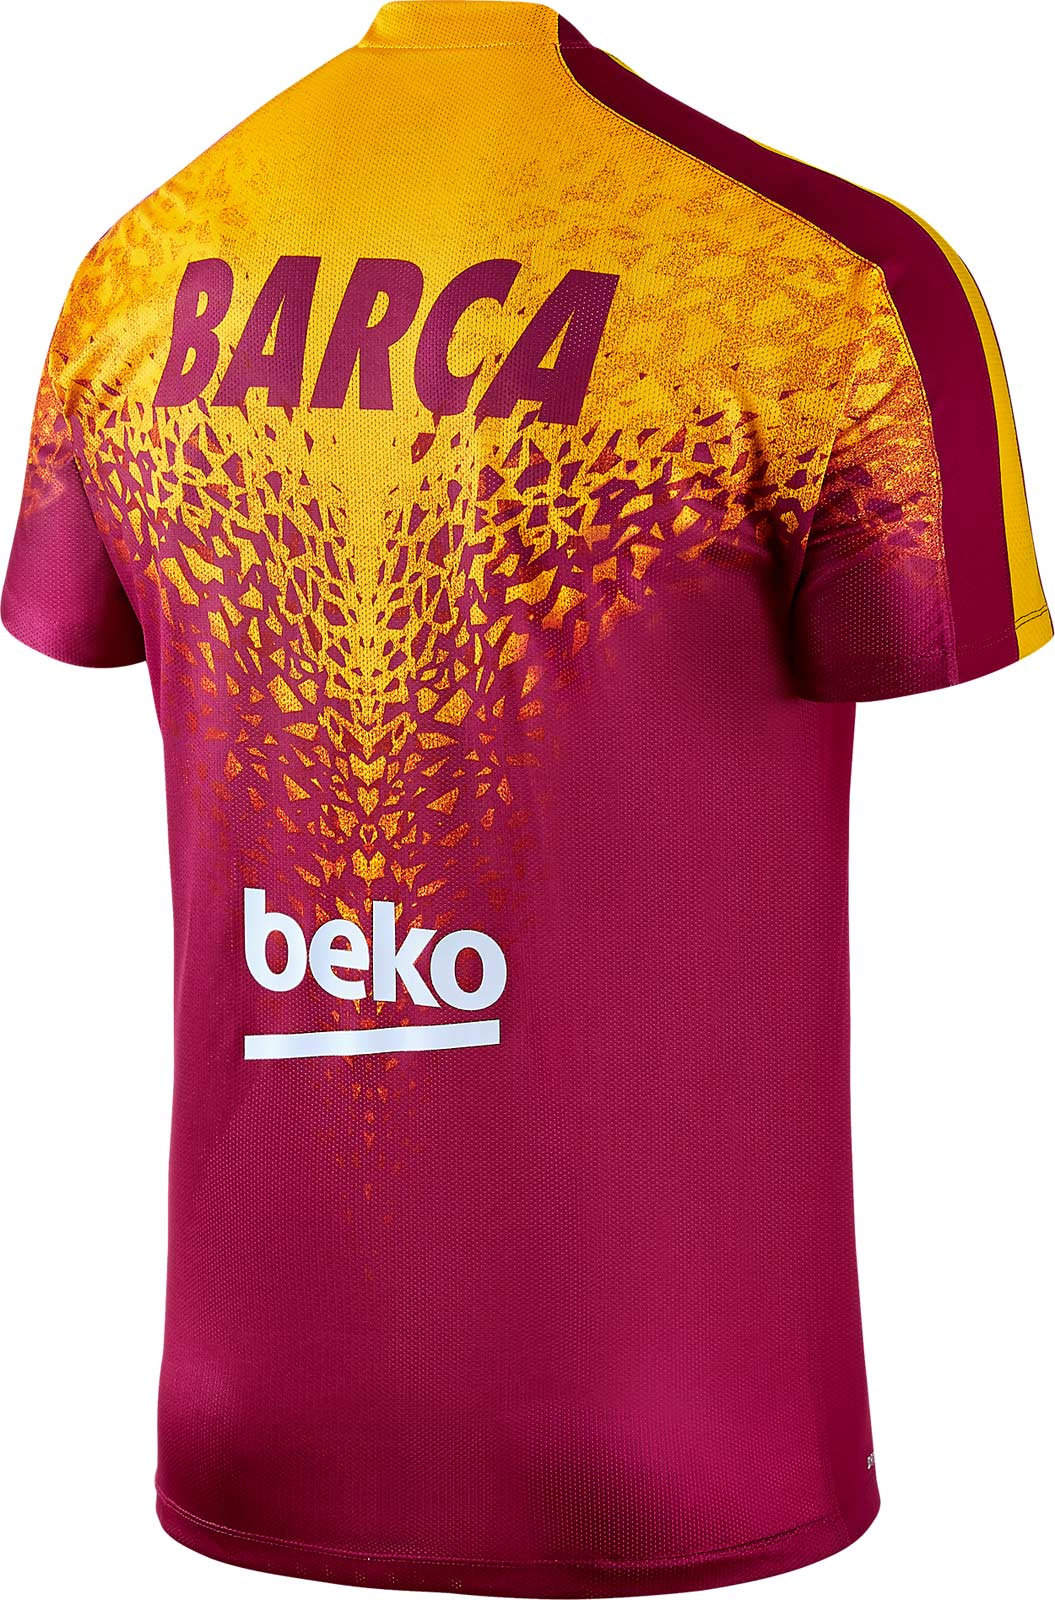 4c97ae31c8b barca new shirt - fba.org.br